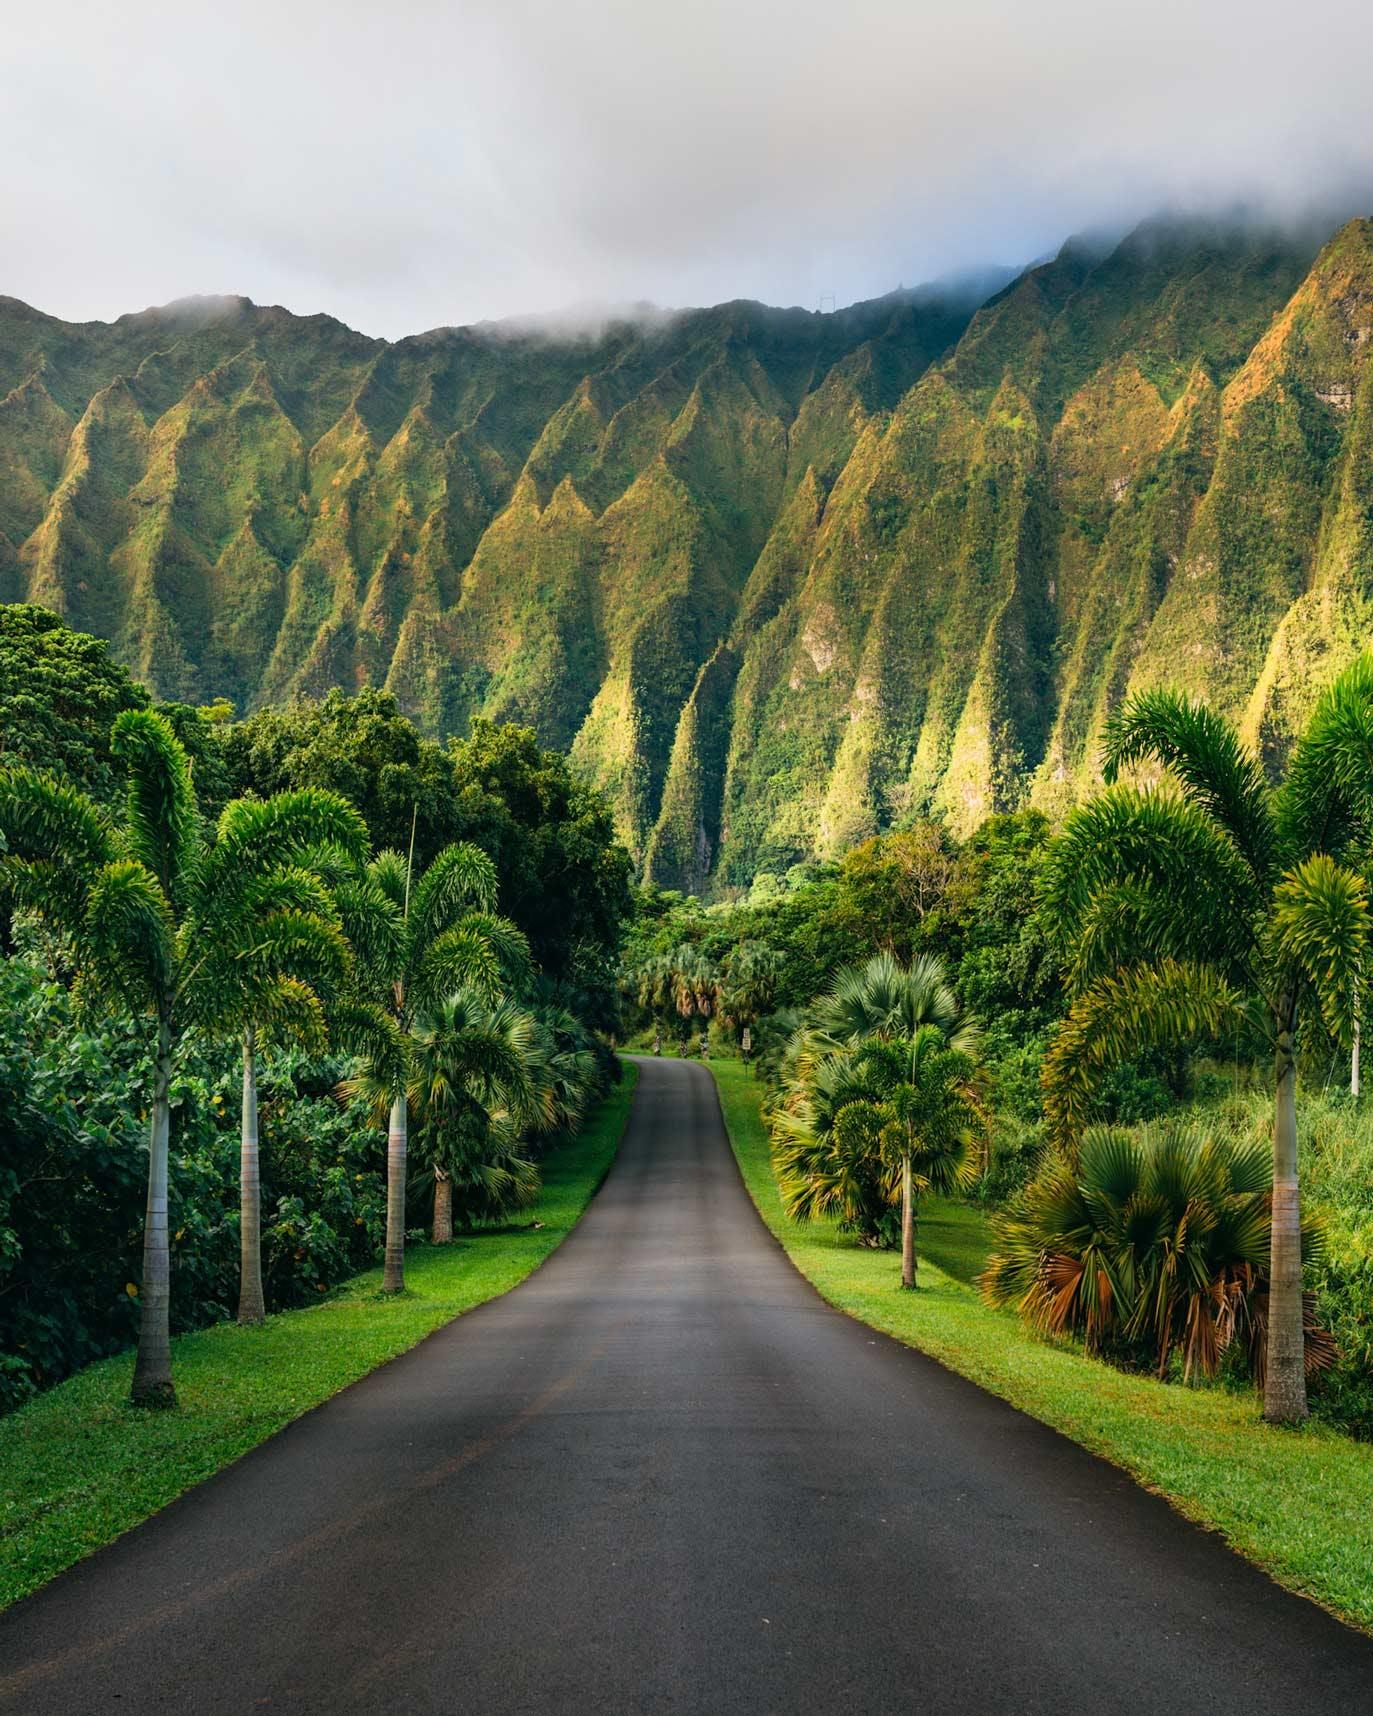 Park Access Road view of Ho'omaluhia Botanical Garden